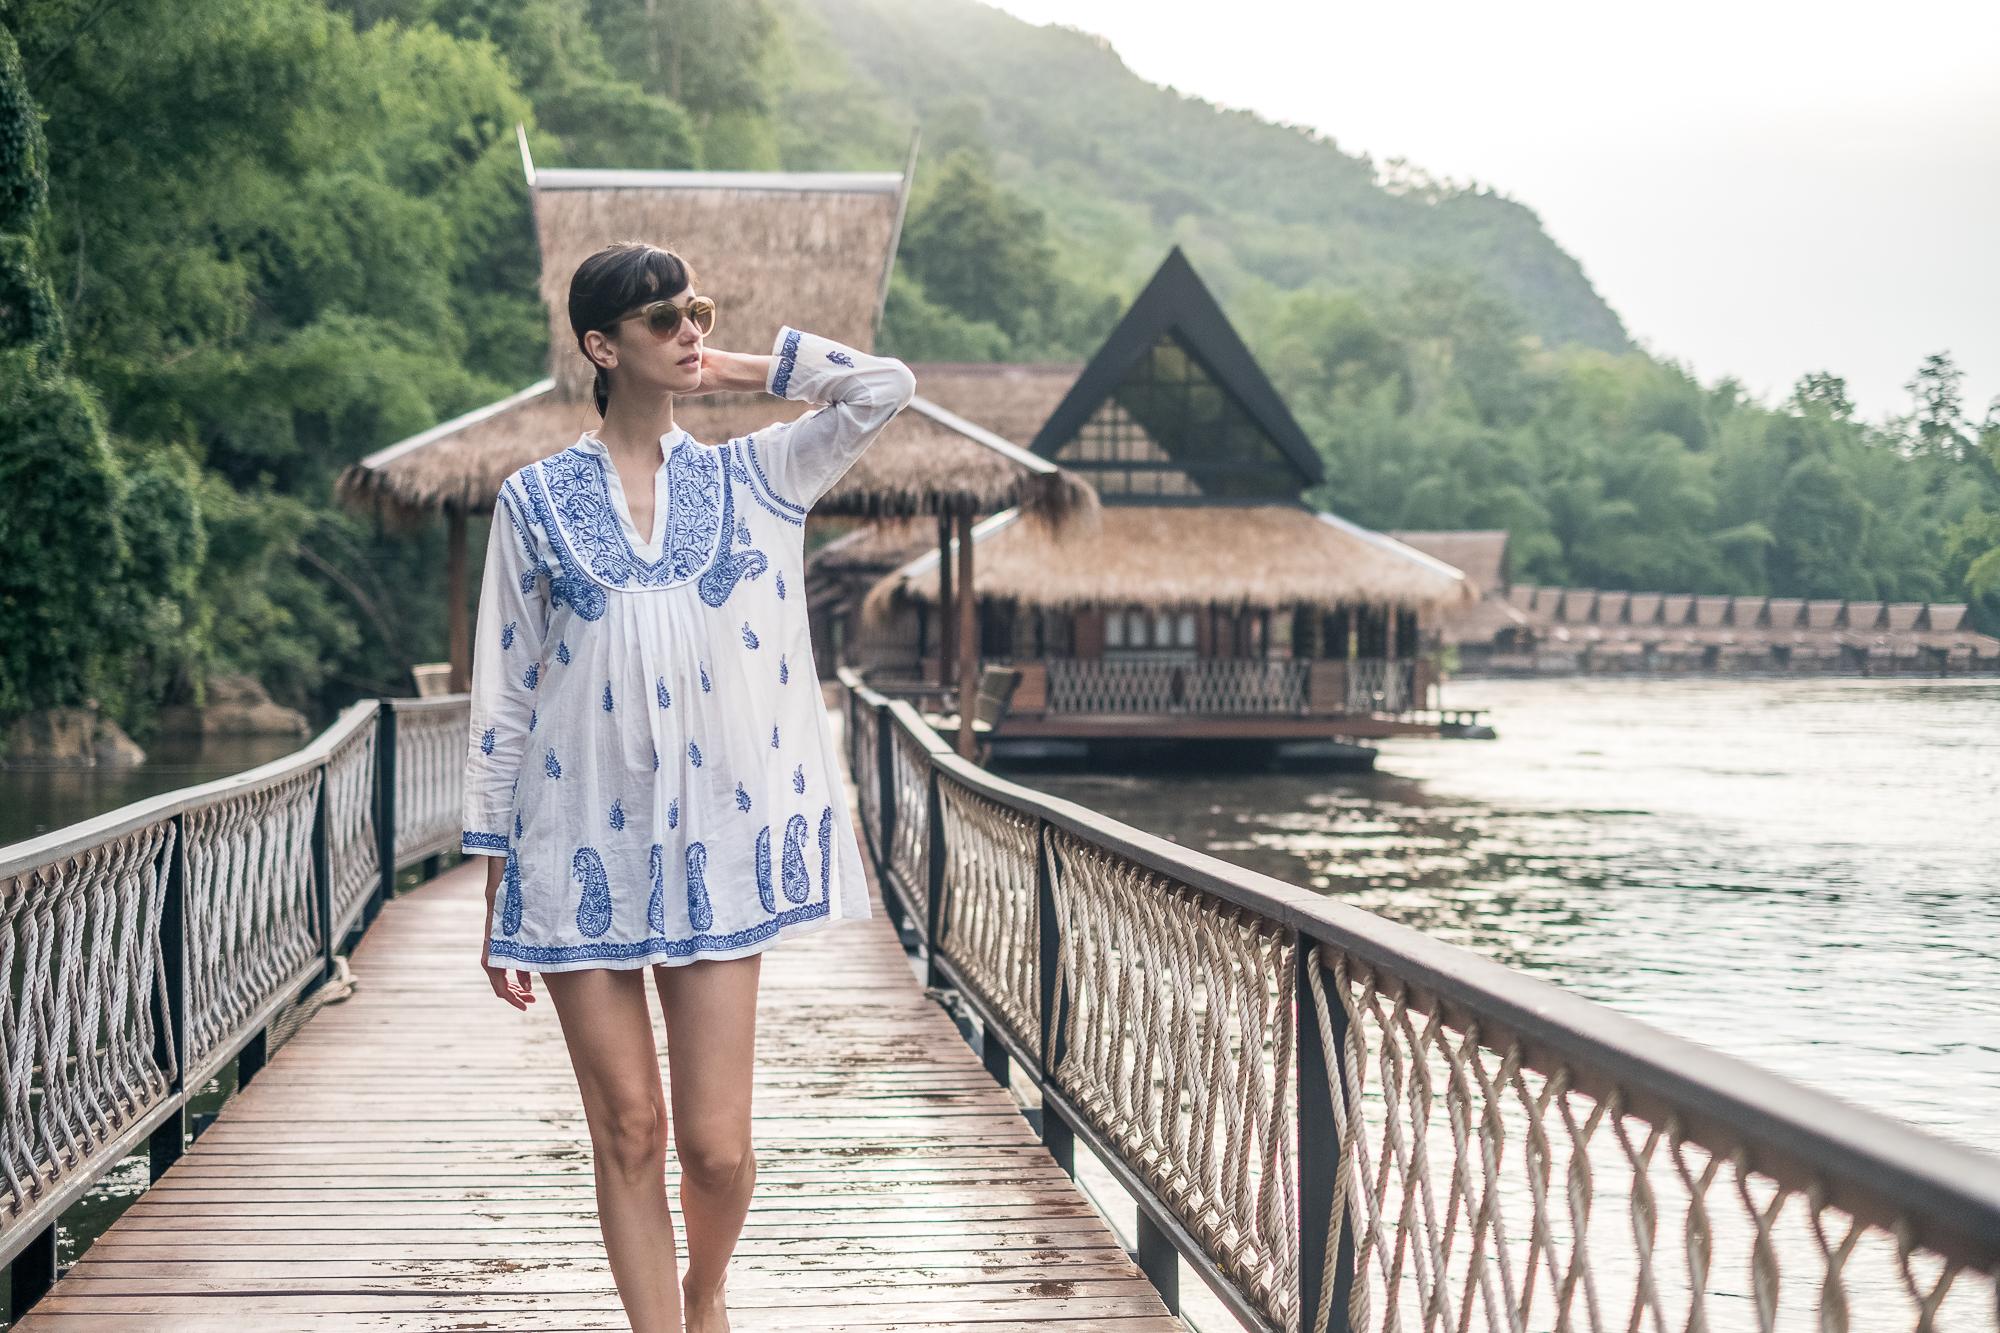 THAILAND_Honeymoon_TheOutsiderBlog_DSCF0838.JPG